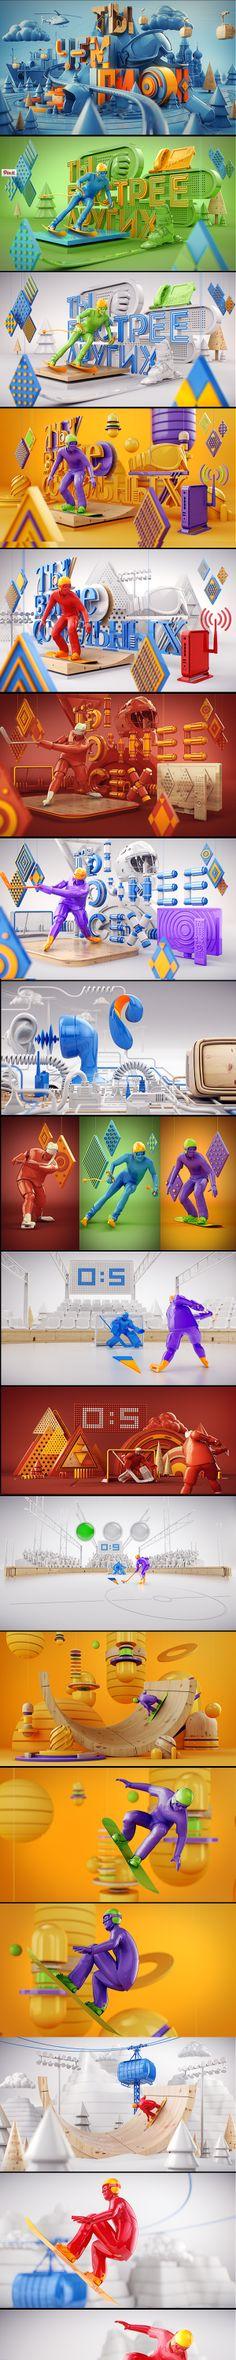 https://www.behance.net/gallery/Rostelecom-Olympic-Promosite/15758477